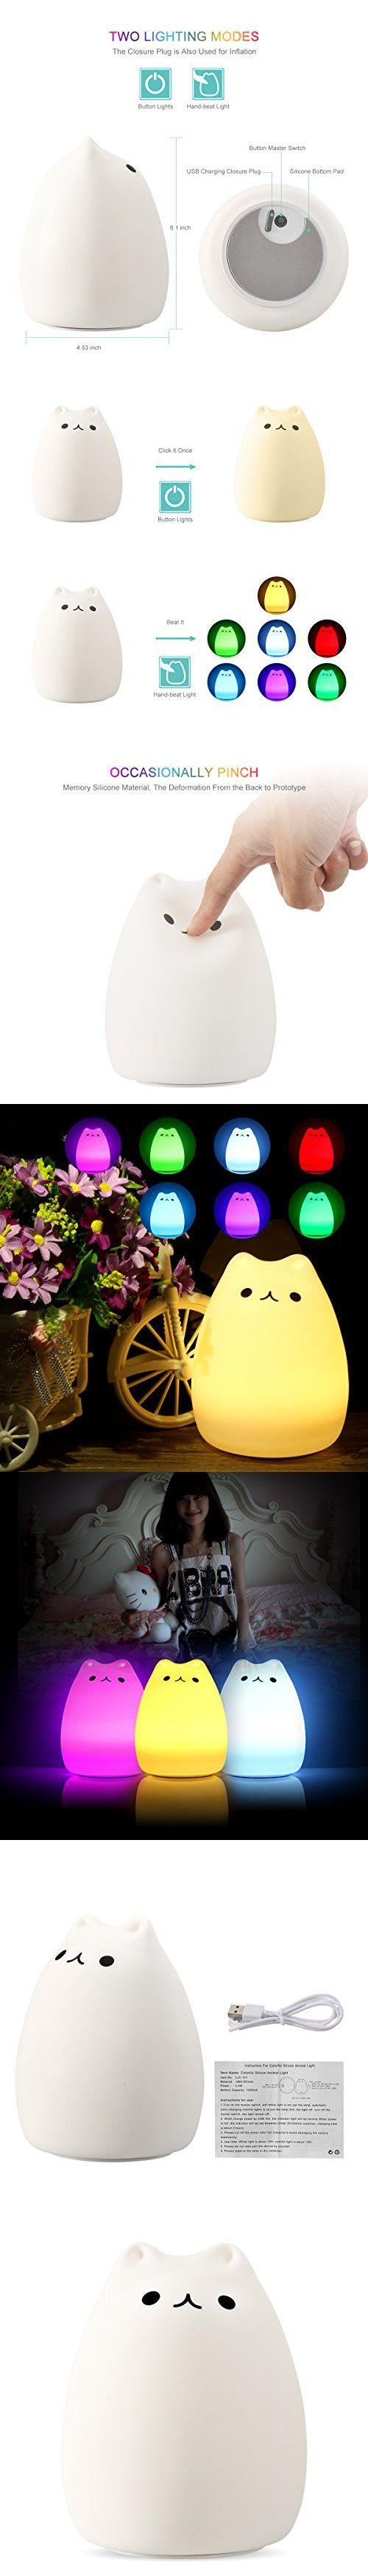 Led night light kickstarter - Colorful Silicon Cute Cat Led Night Light Tap Sensor Control Usb Rechargeable Lighting